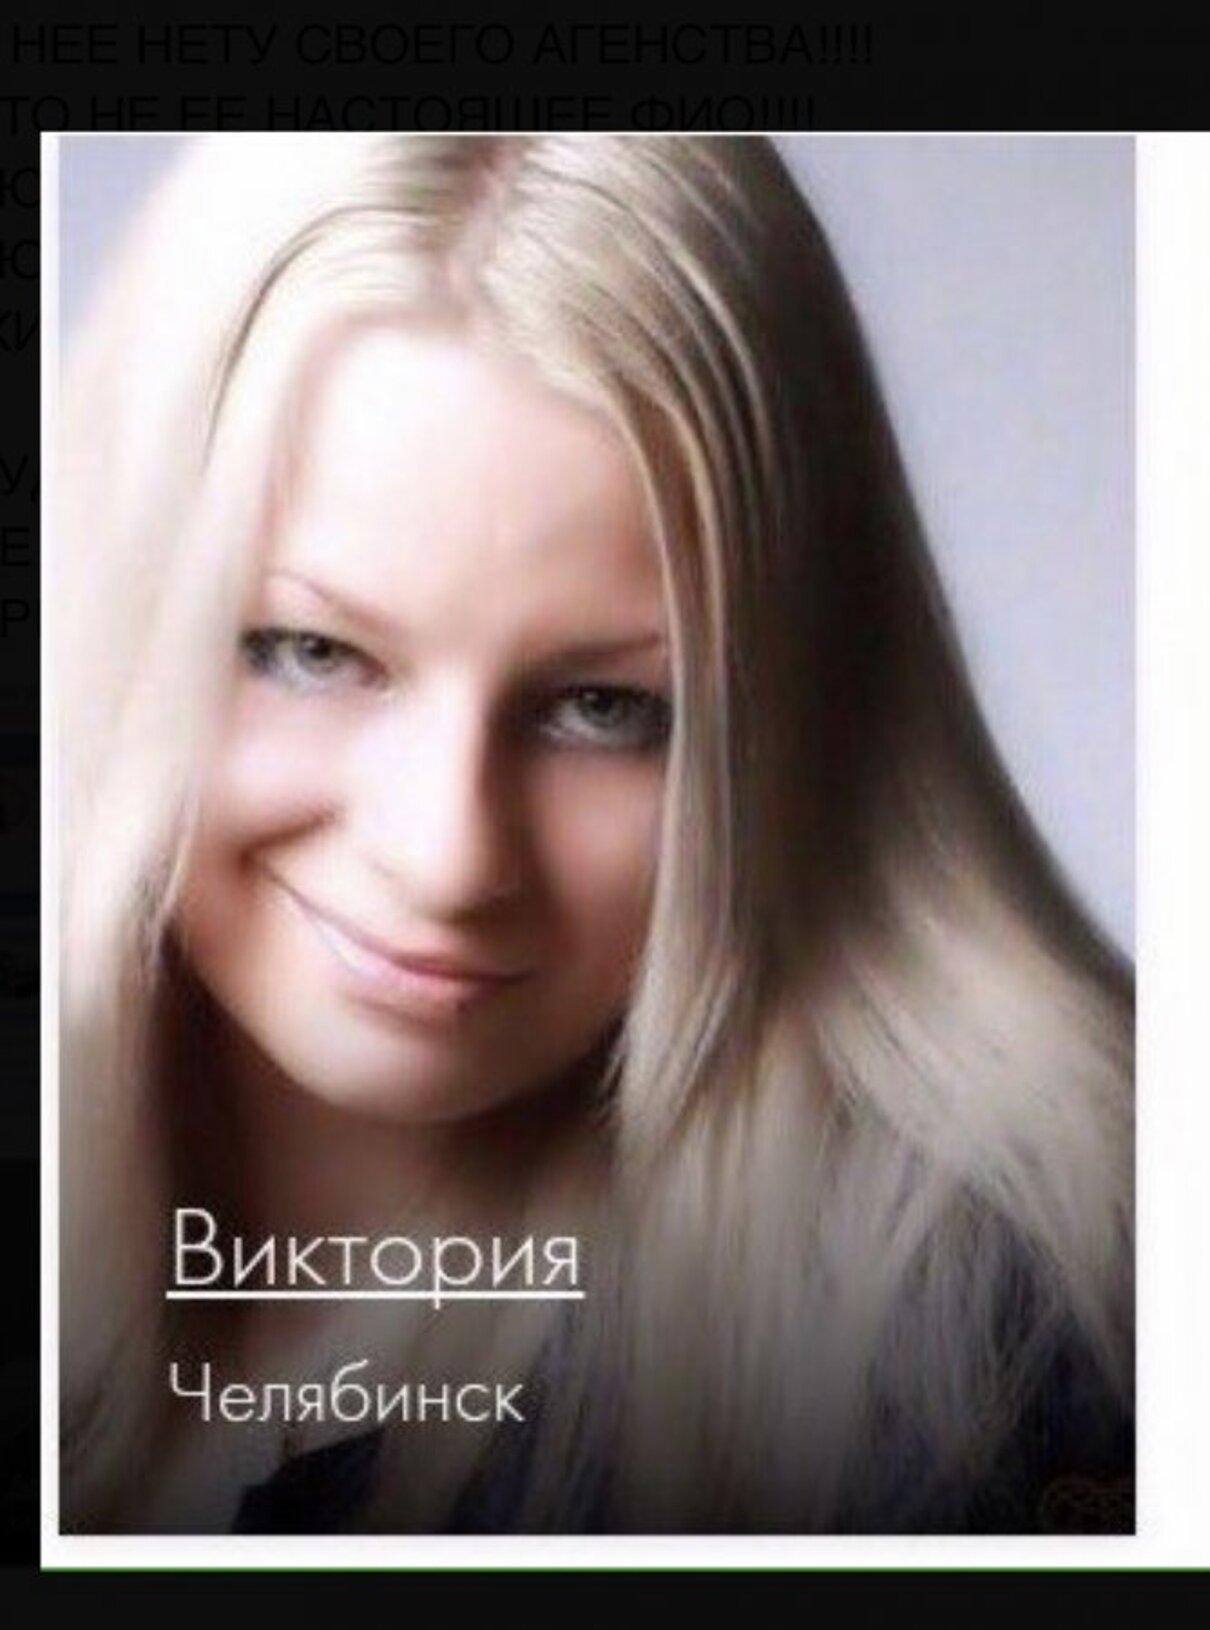 Жалоба-отзыв: Лика Крылаева, Lika Krylaeva - Мошенница.  Фото №2